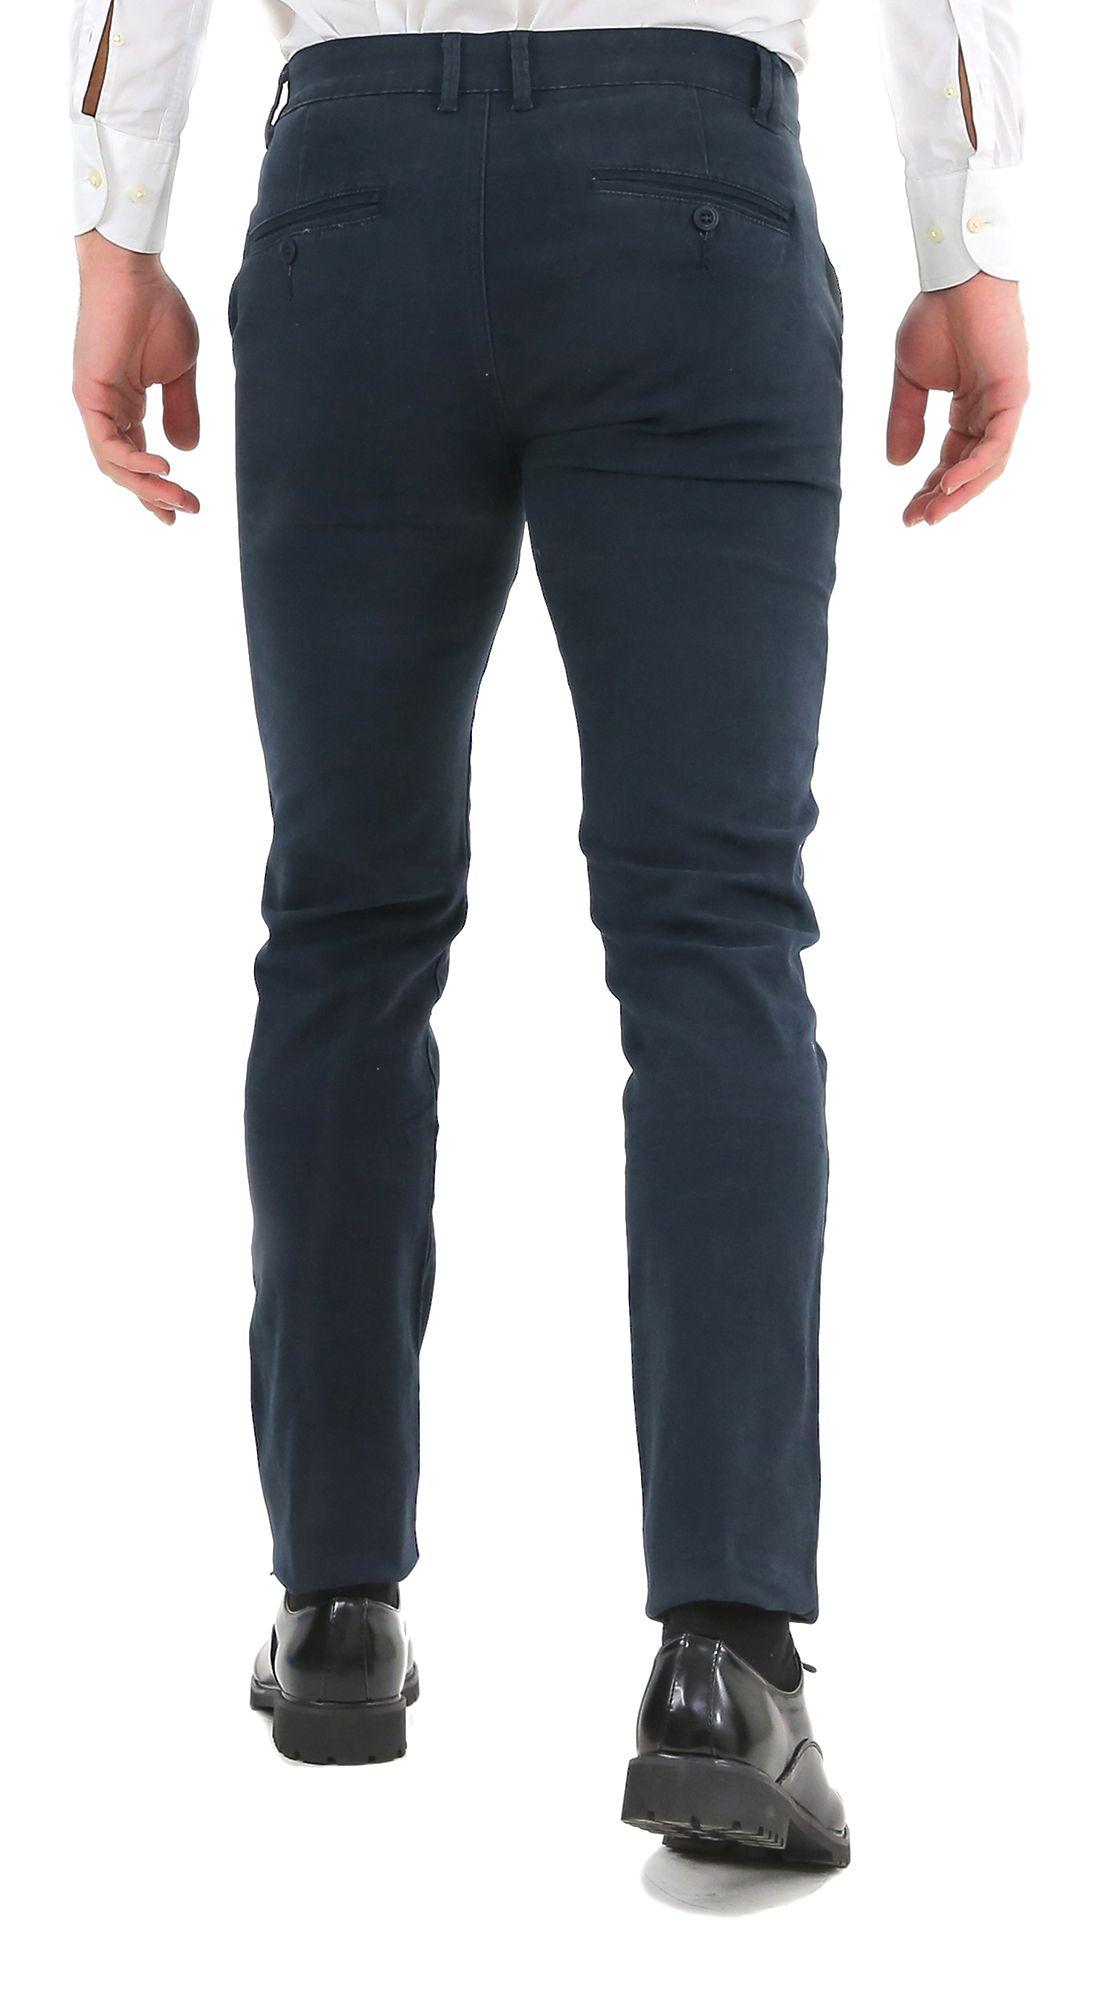 Pantaloni-Uomo-Slim-Fit-Eleganti-Invernali-Blu-Nero-Classico-Chino-Tasca-America miniatura 4